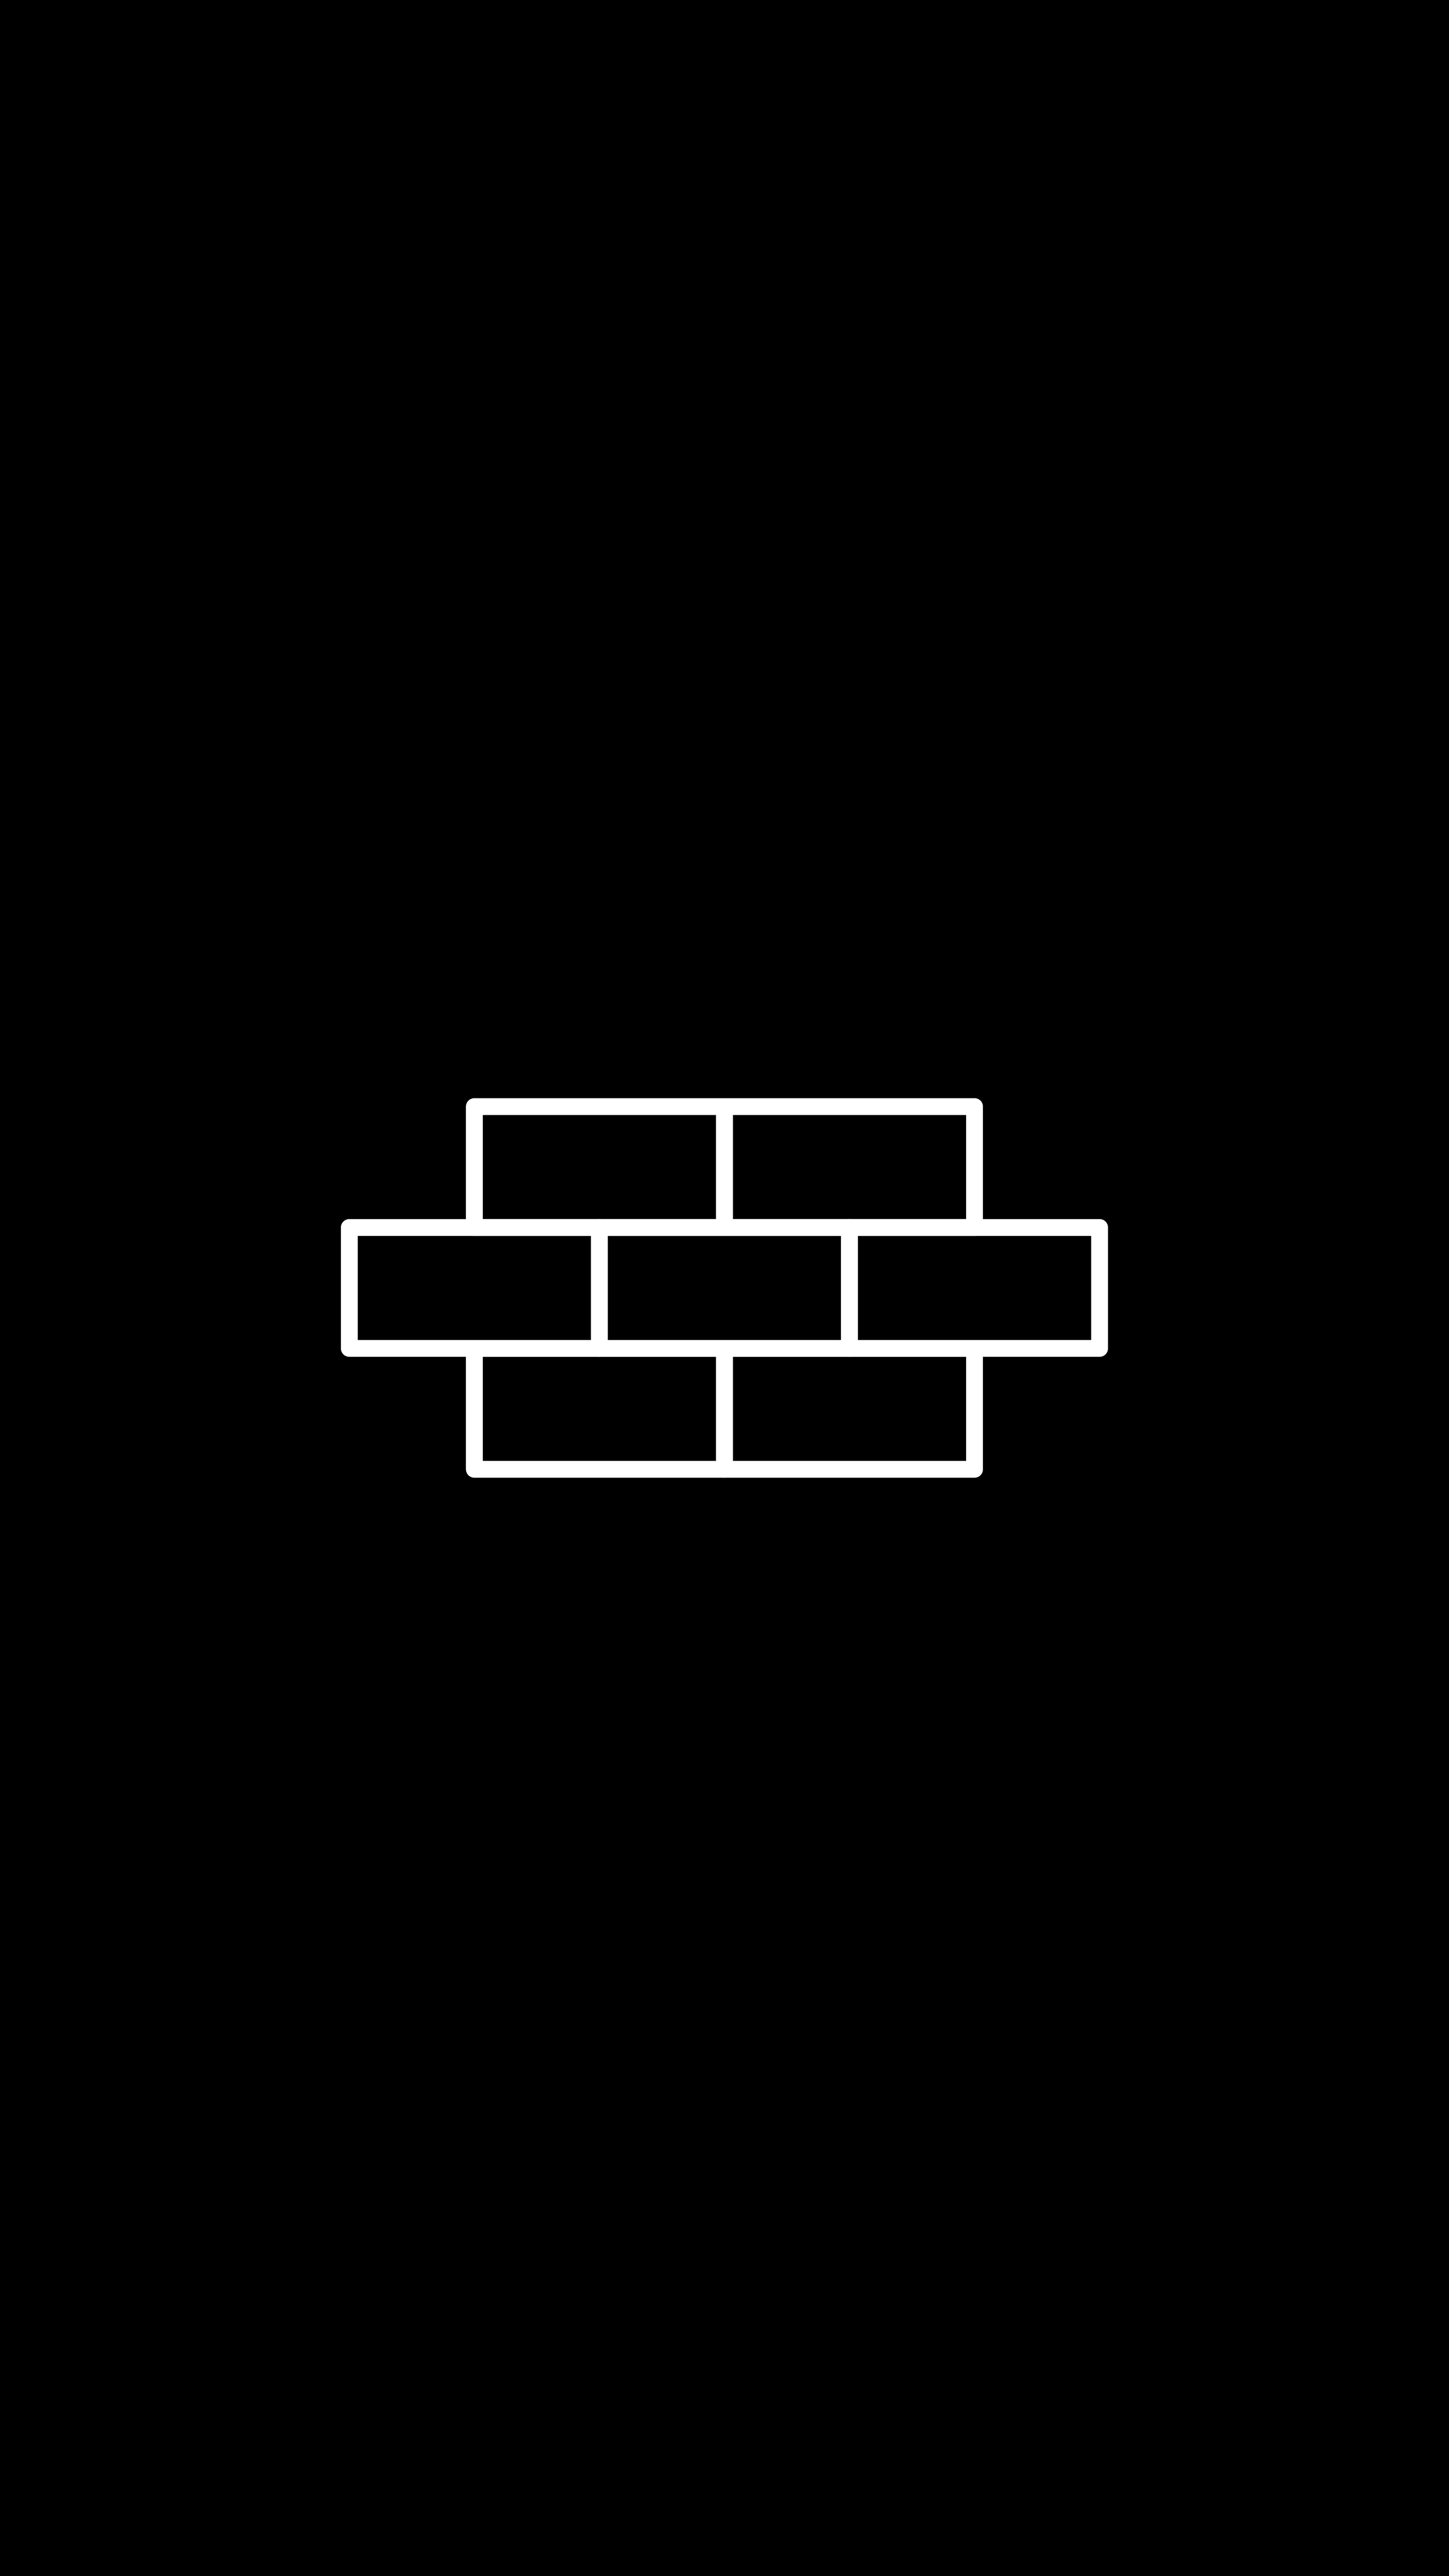 Brick, Subway Tile, Tile